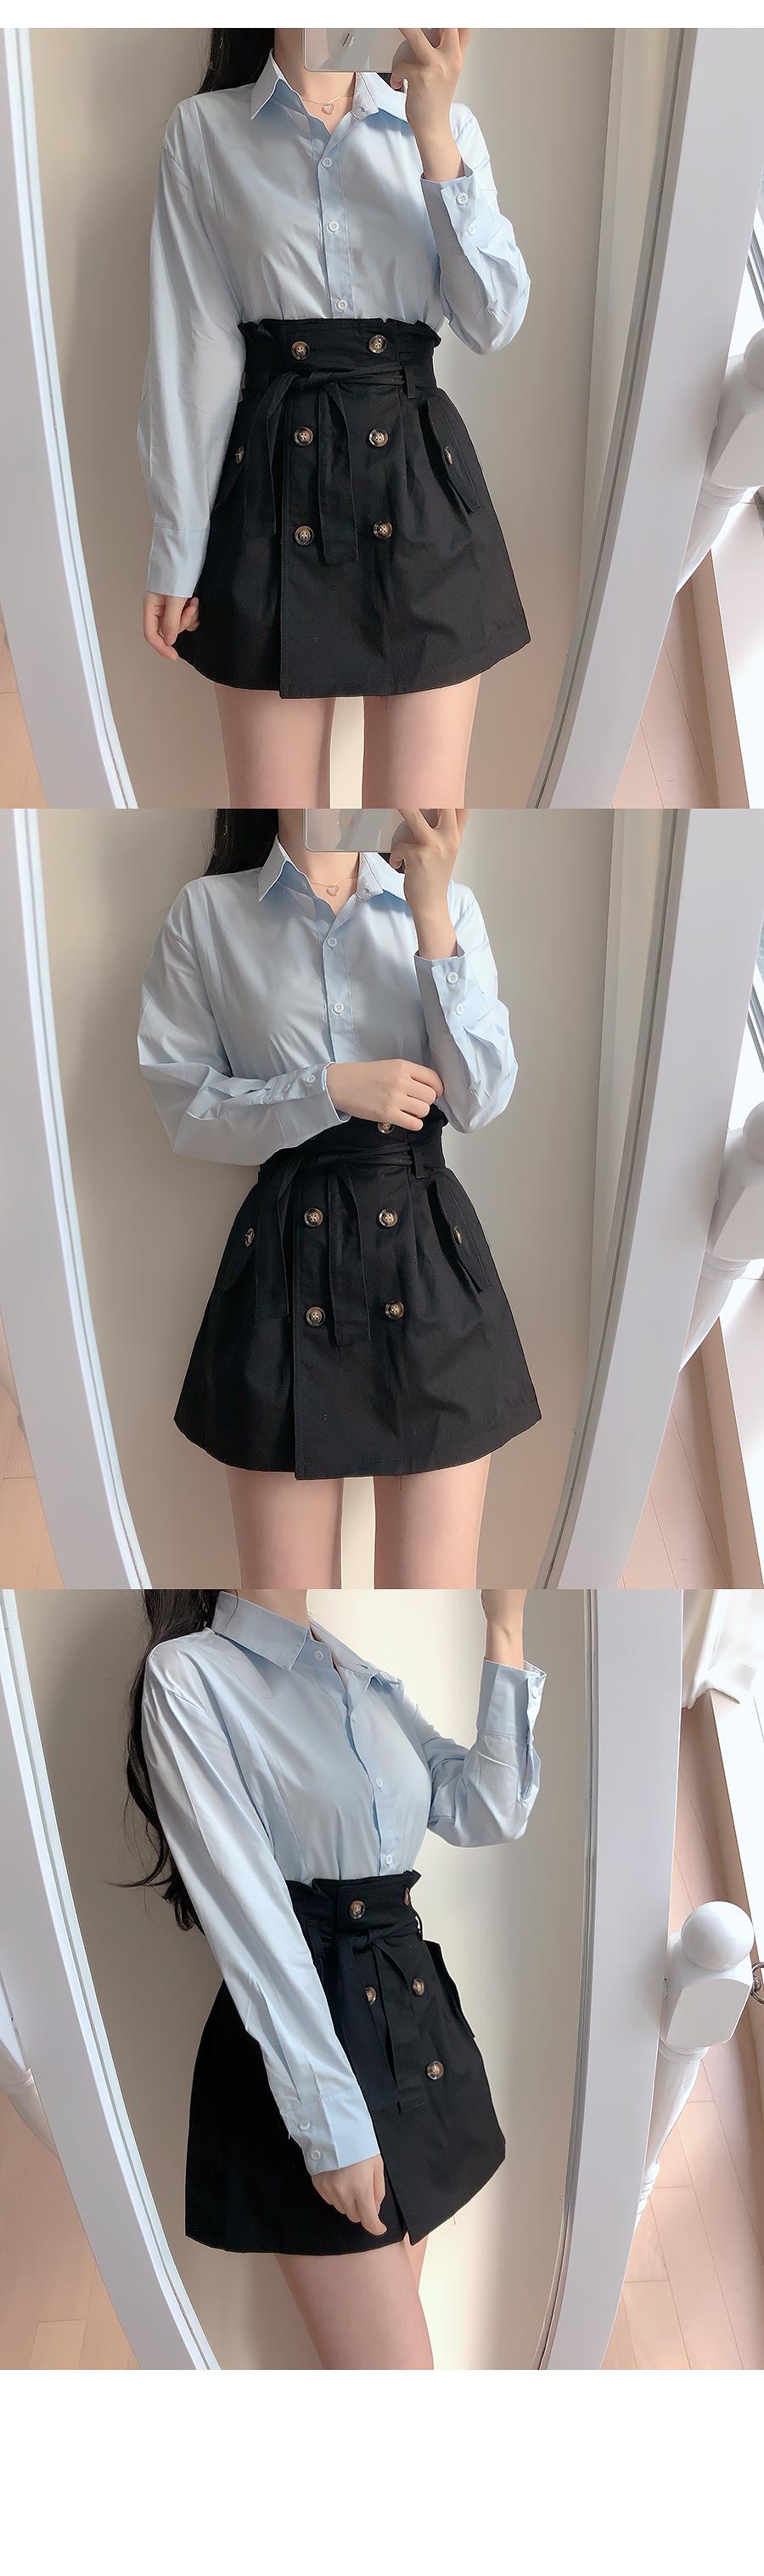 Milano collar shirt + trench skirt set